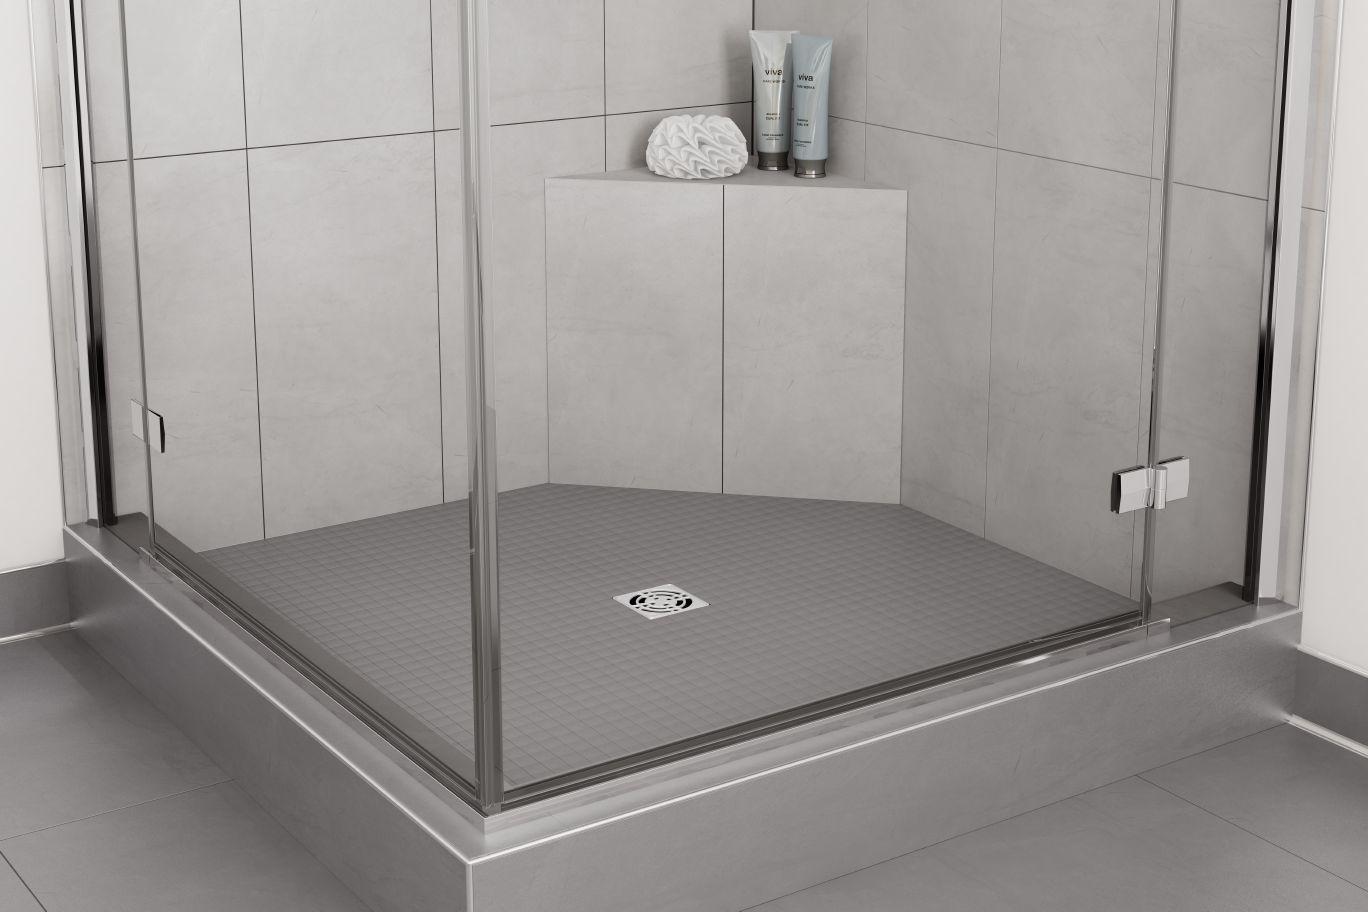 Vanite Salle De Bain Ciot ~ schluter kerdi shower sb schluter pinterest panneaux de